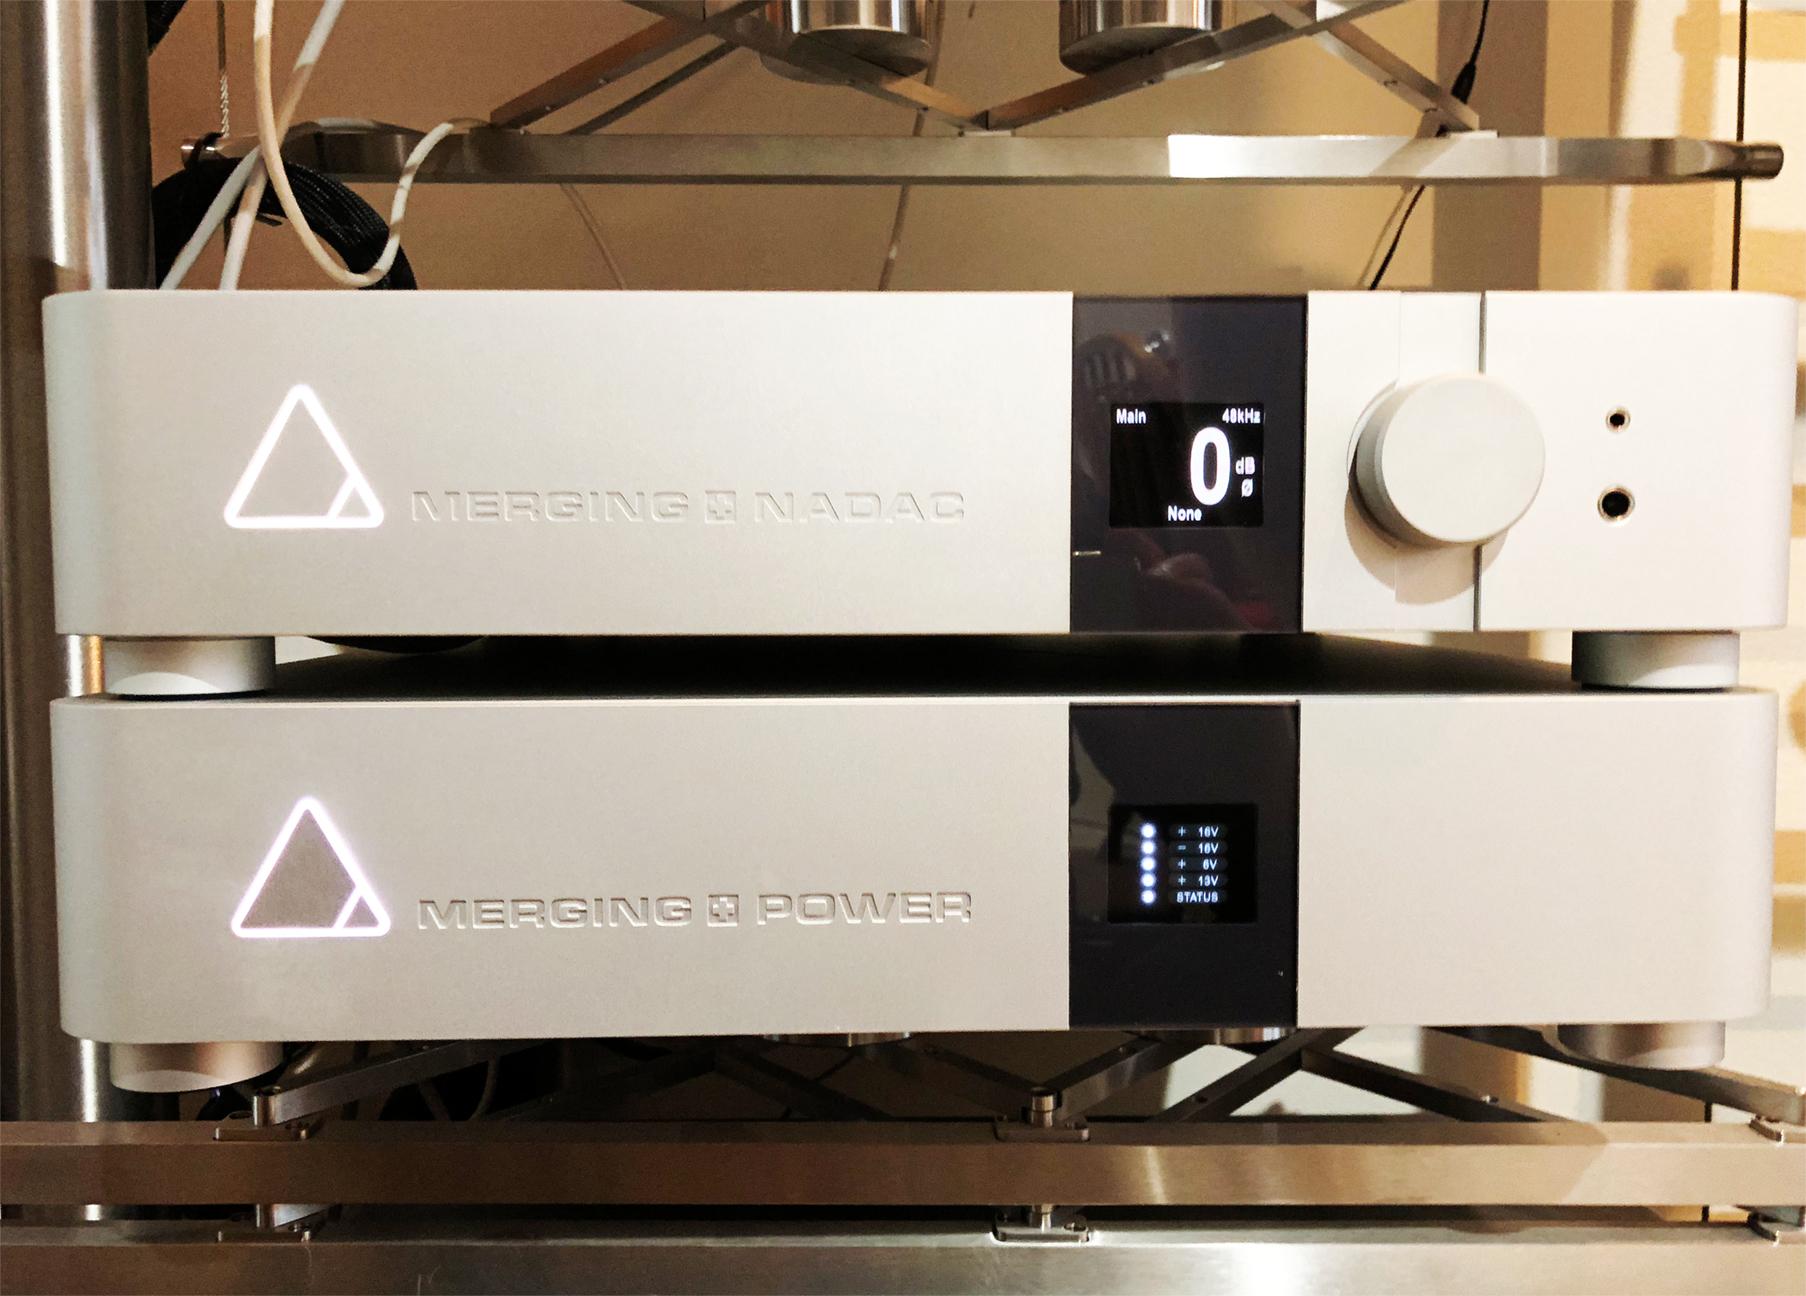 Ultrasonic Cleaning